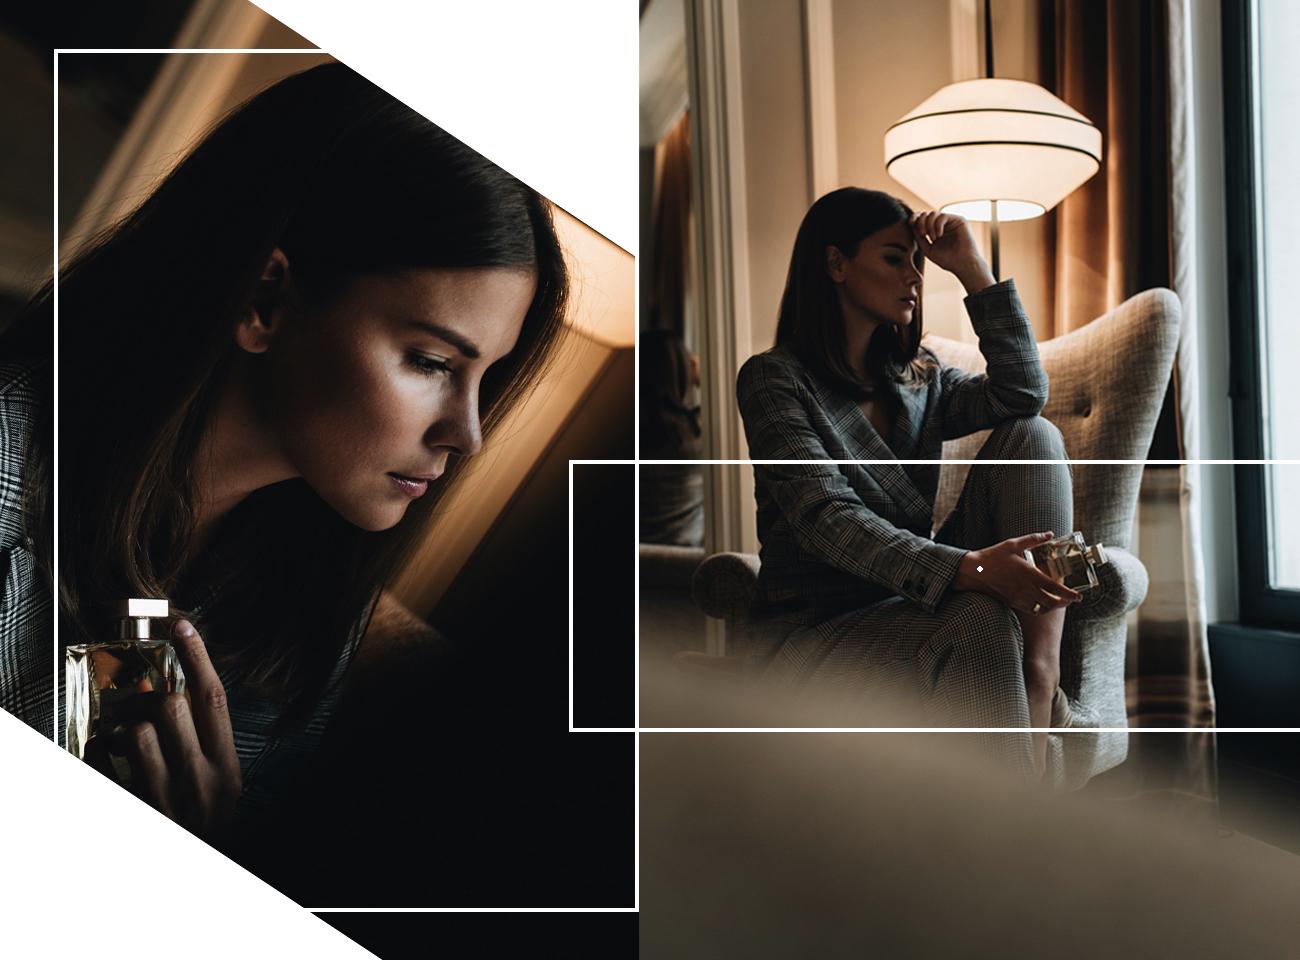 Beauty-editorial-shooting-hotel-zimmer-paris-chanel-parfum-fashiioncarpet-nina-schwichtenberg